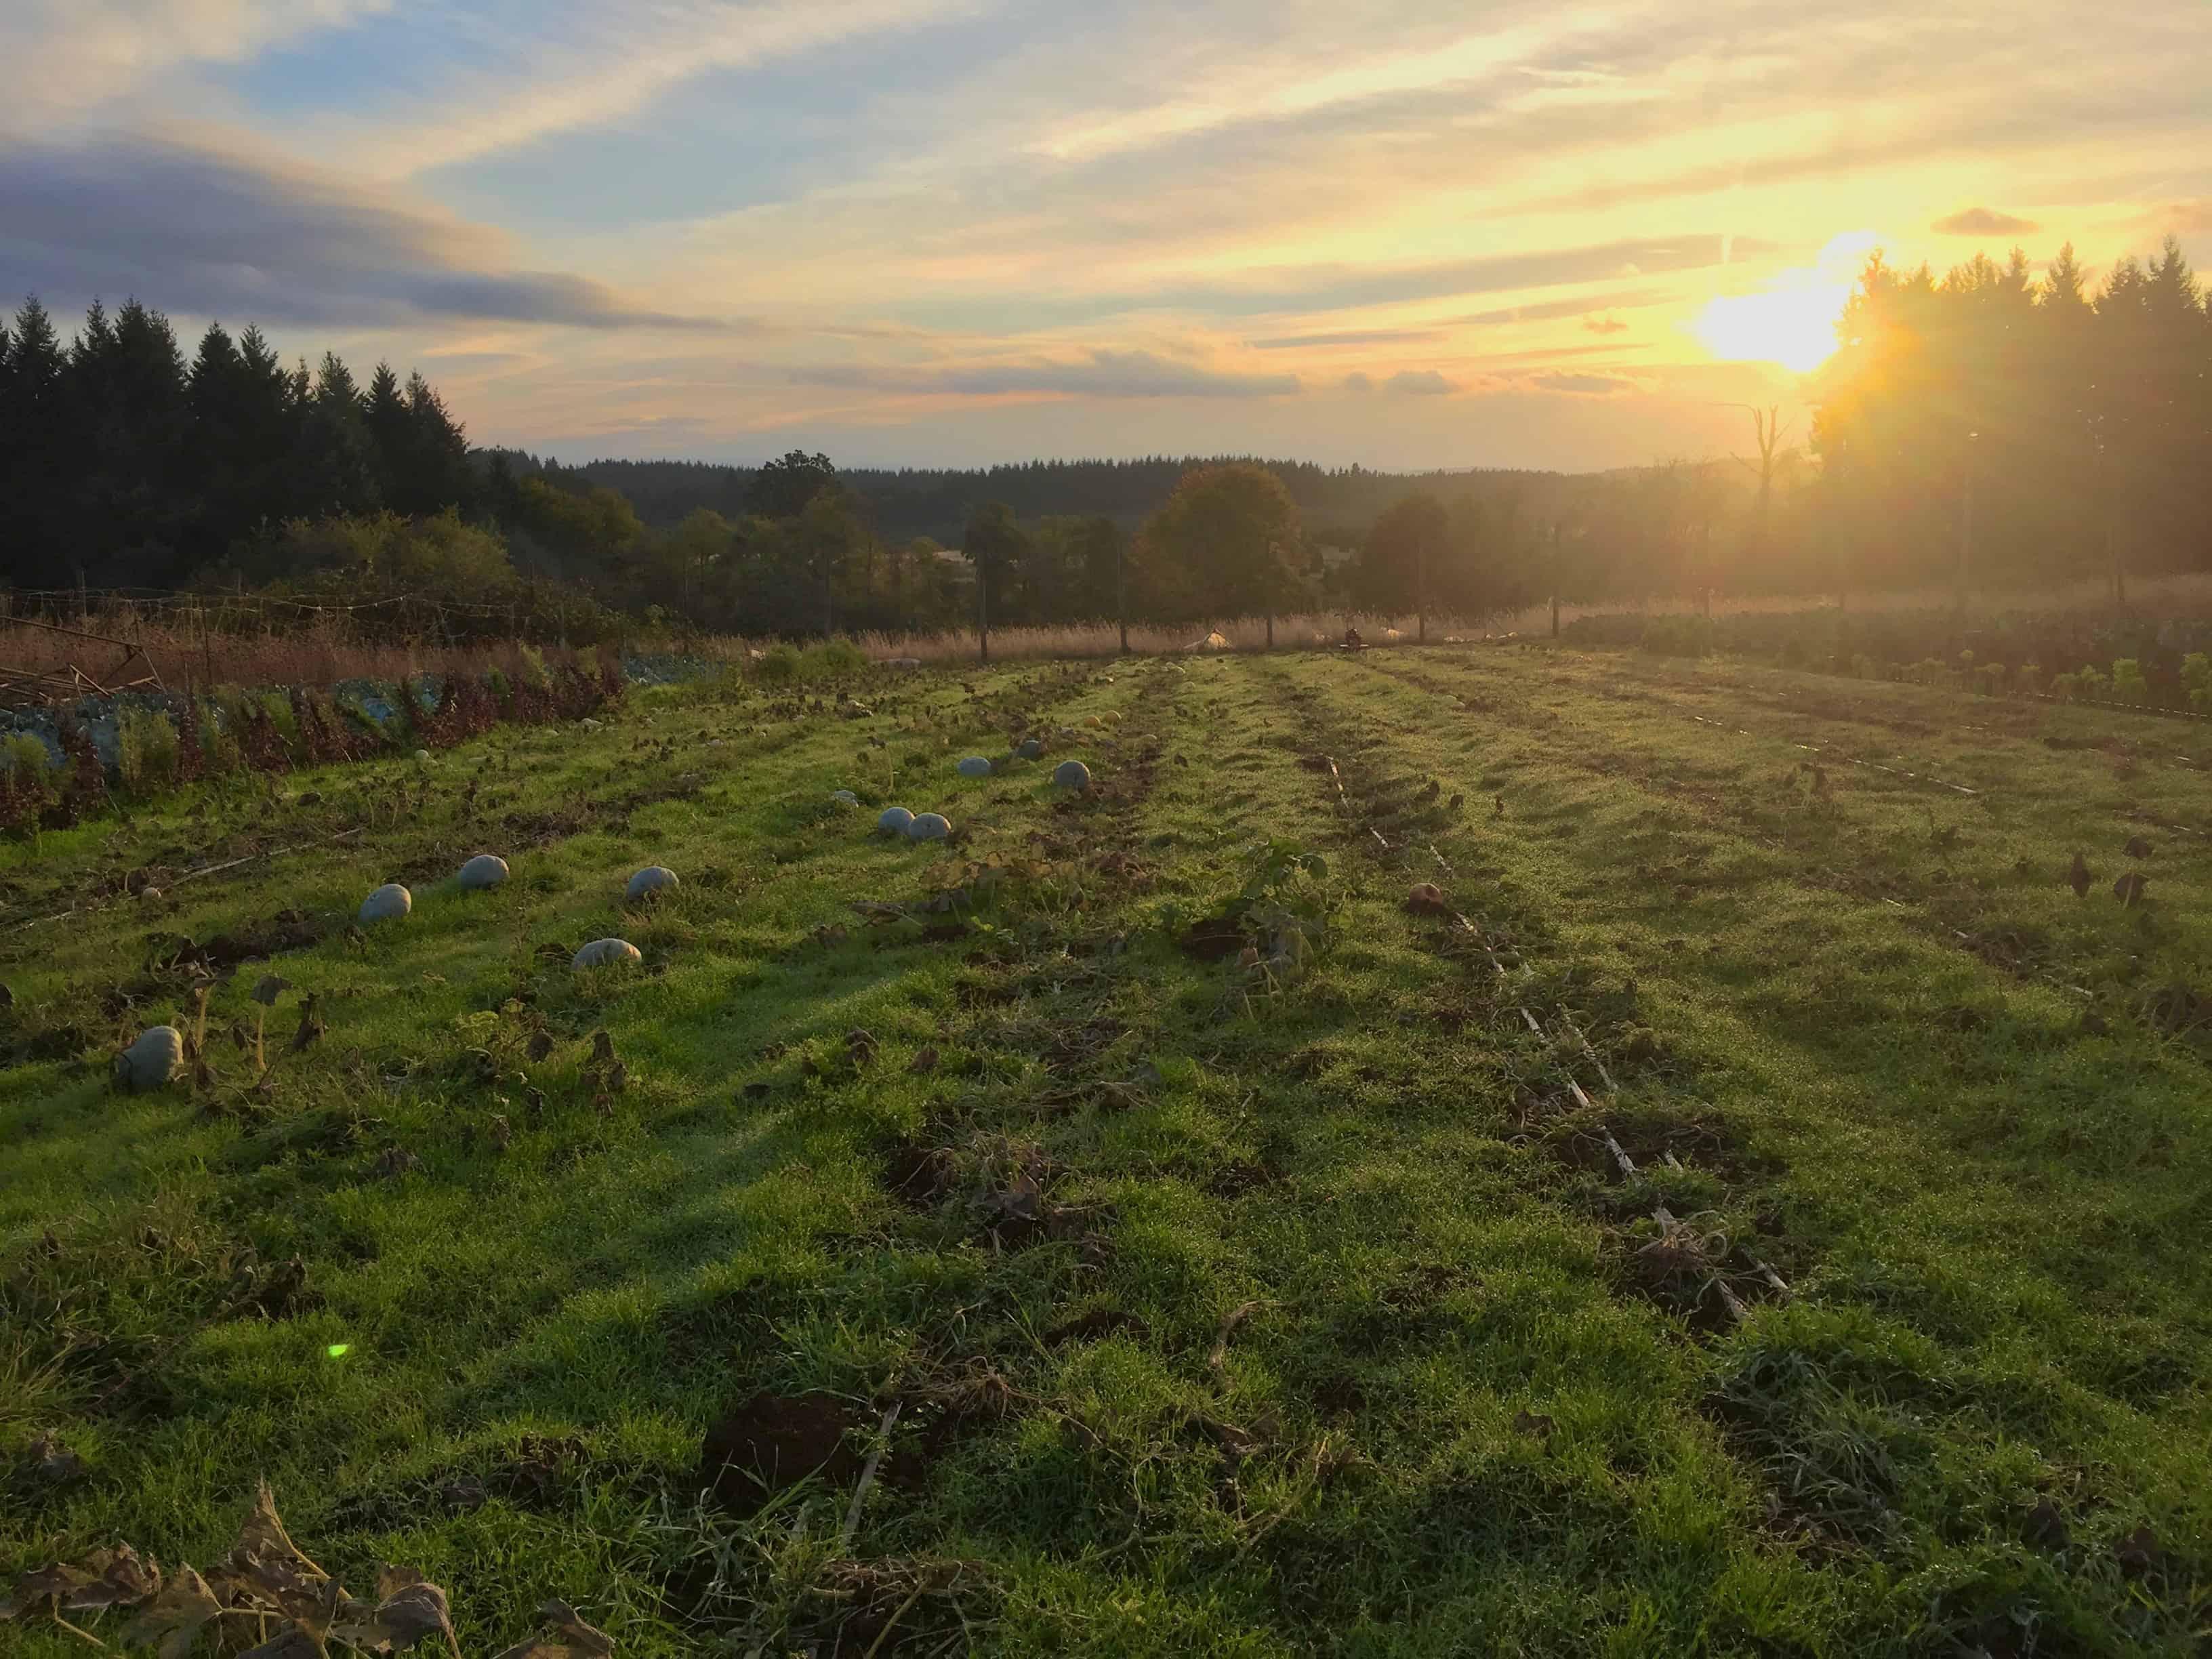 WWOOFing: Work Exchange on an Organic Farm in Oregon - Spin